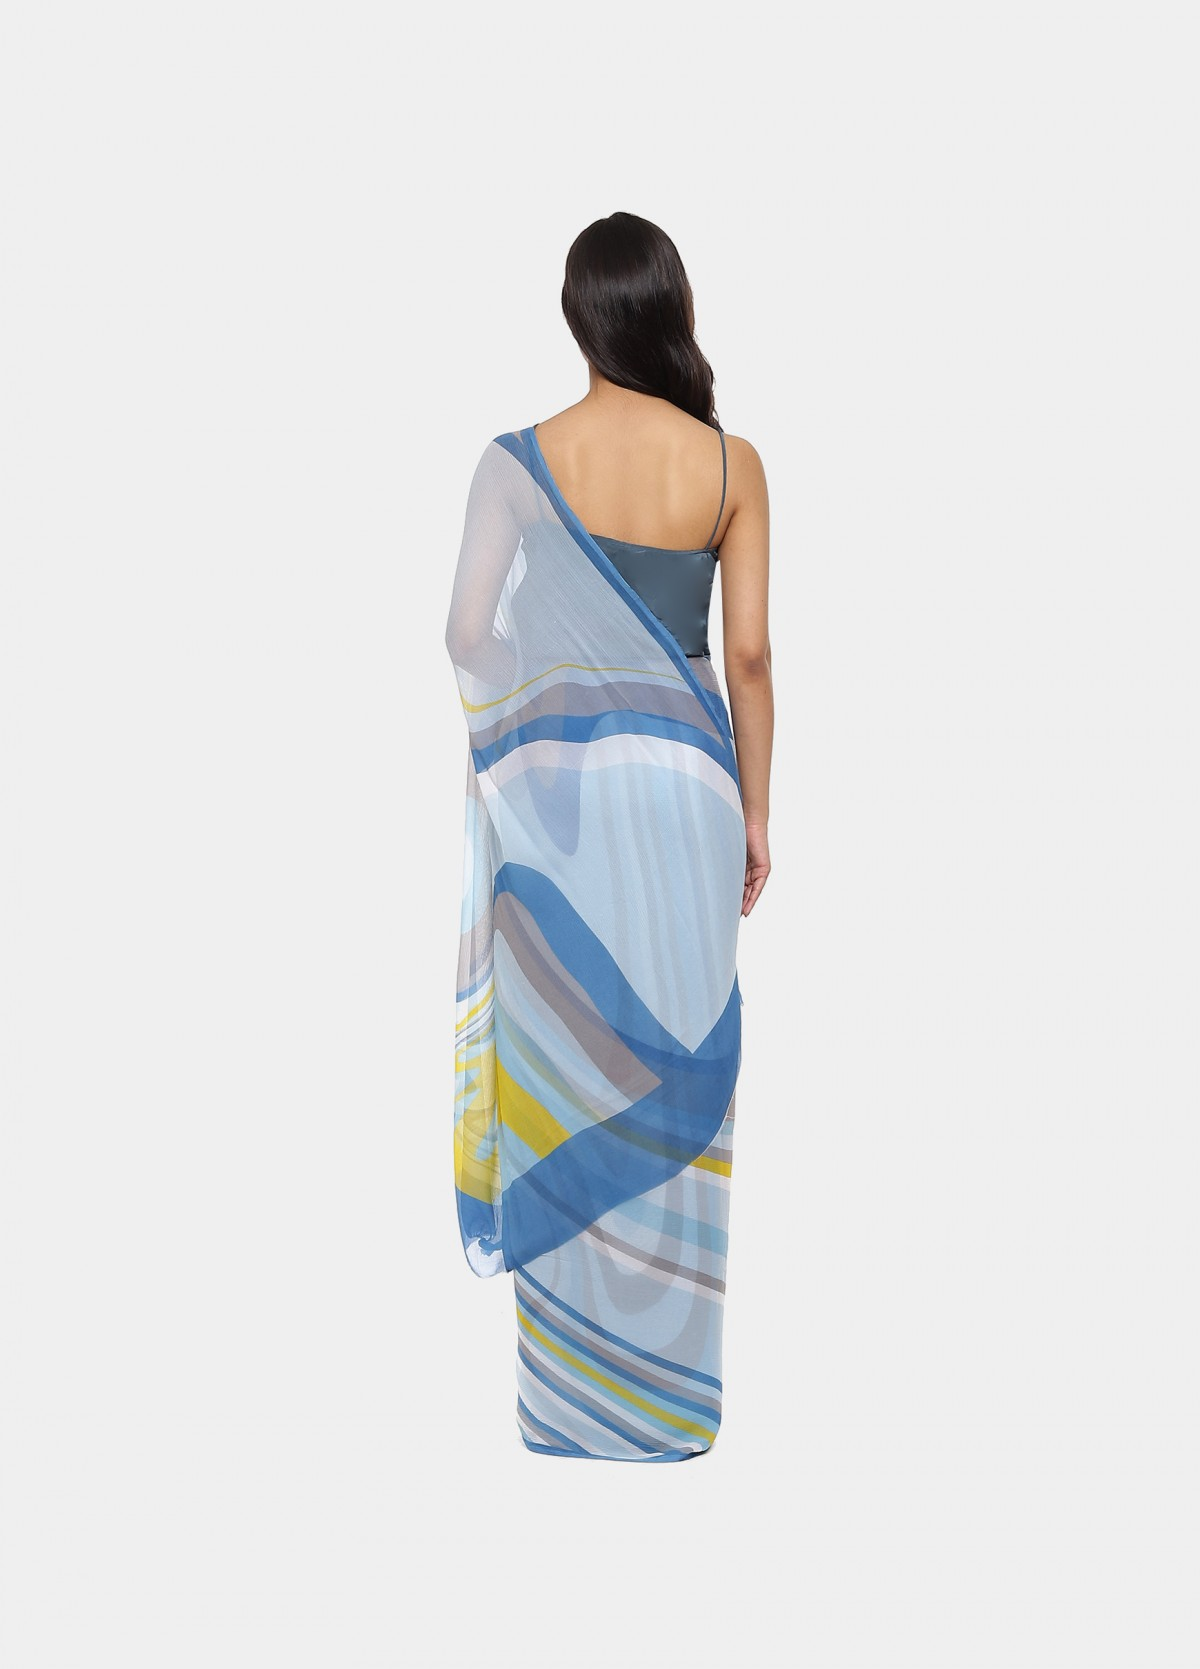 The Hesitation Blue Sari